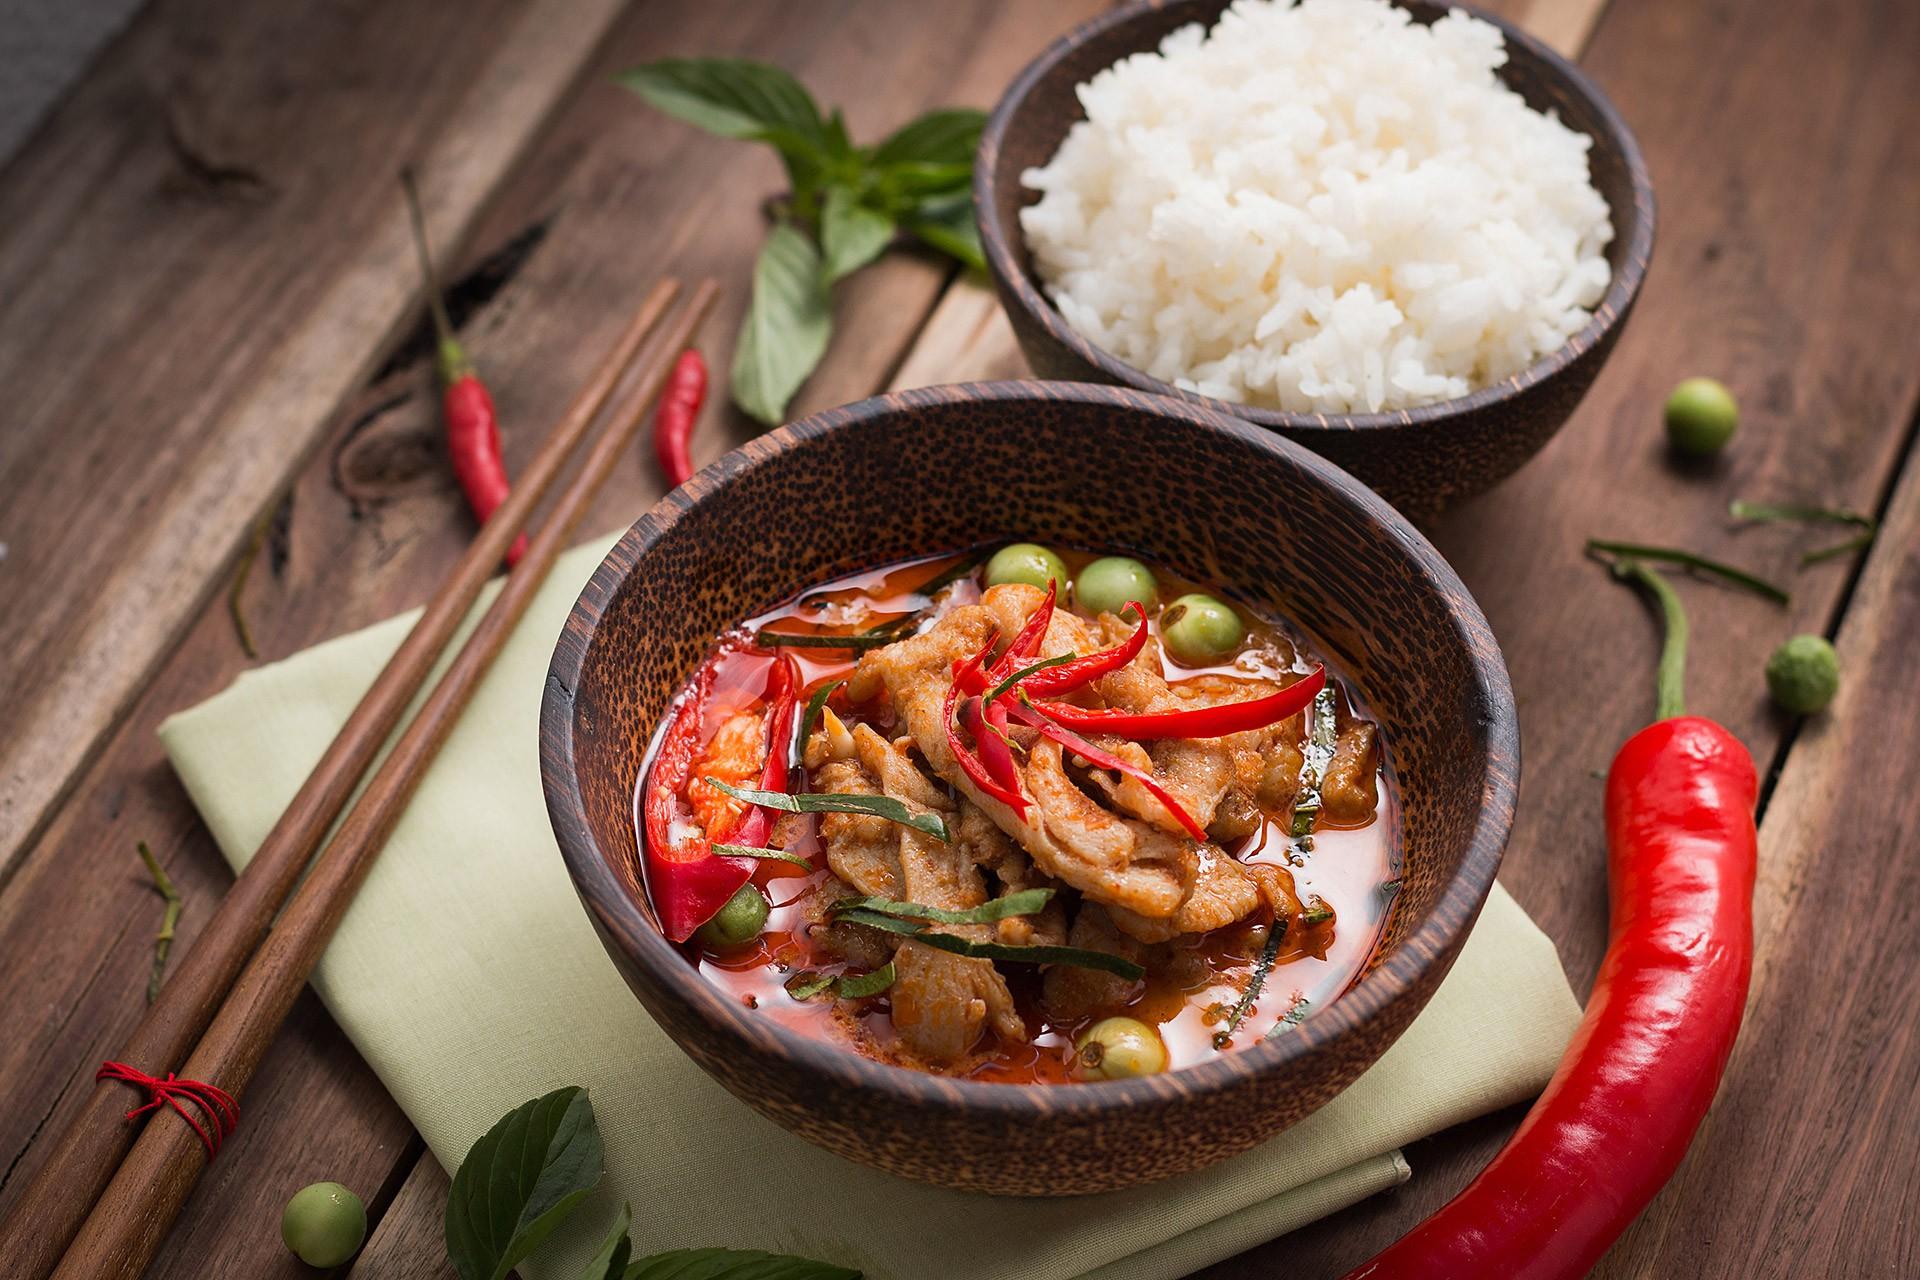 Het lekkerste Thaise takeout restaurant in de buurt van Merksem